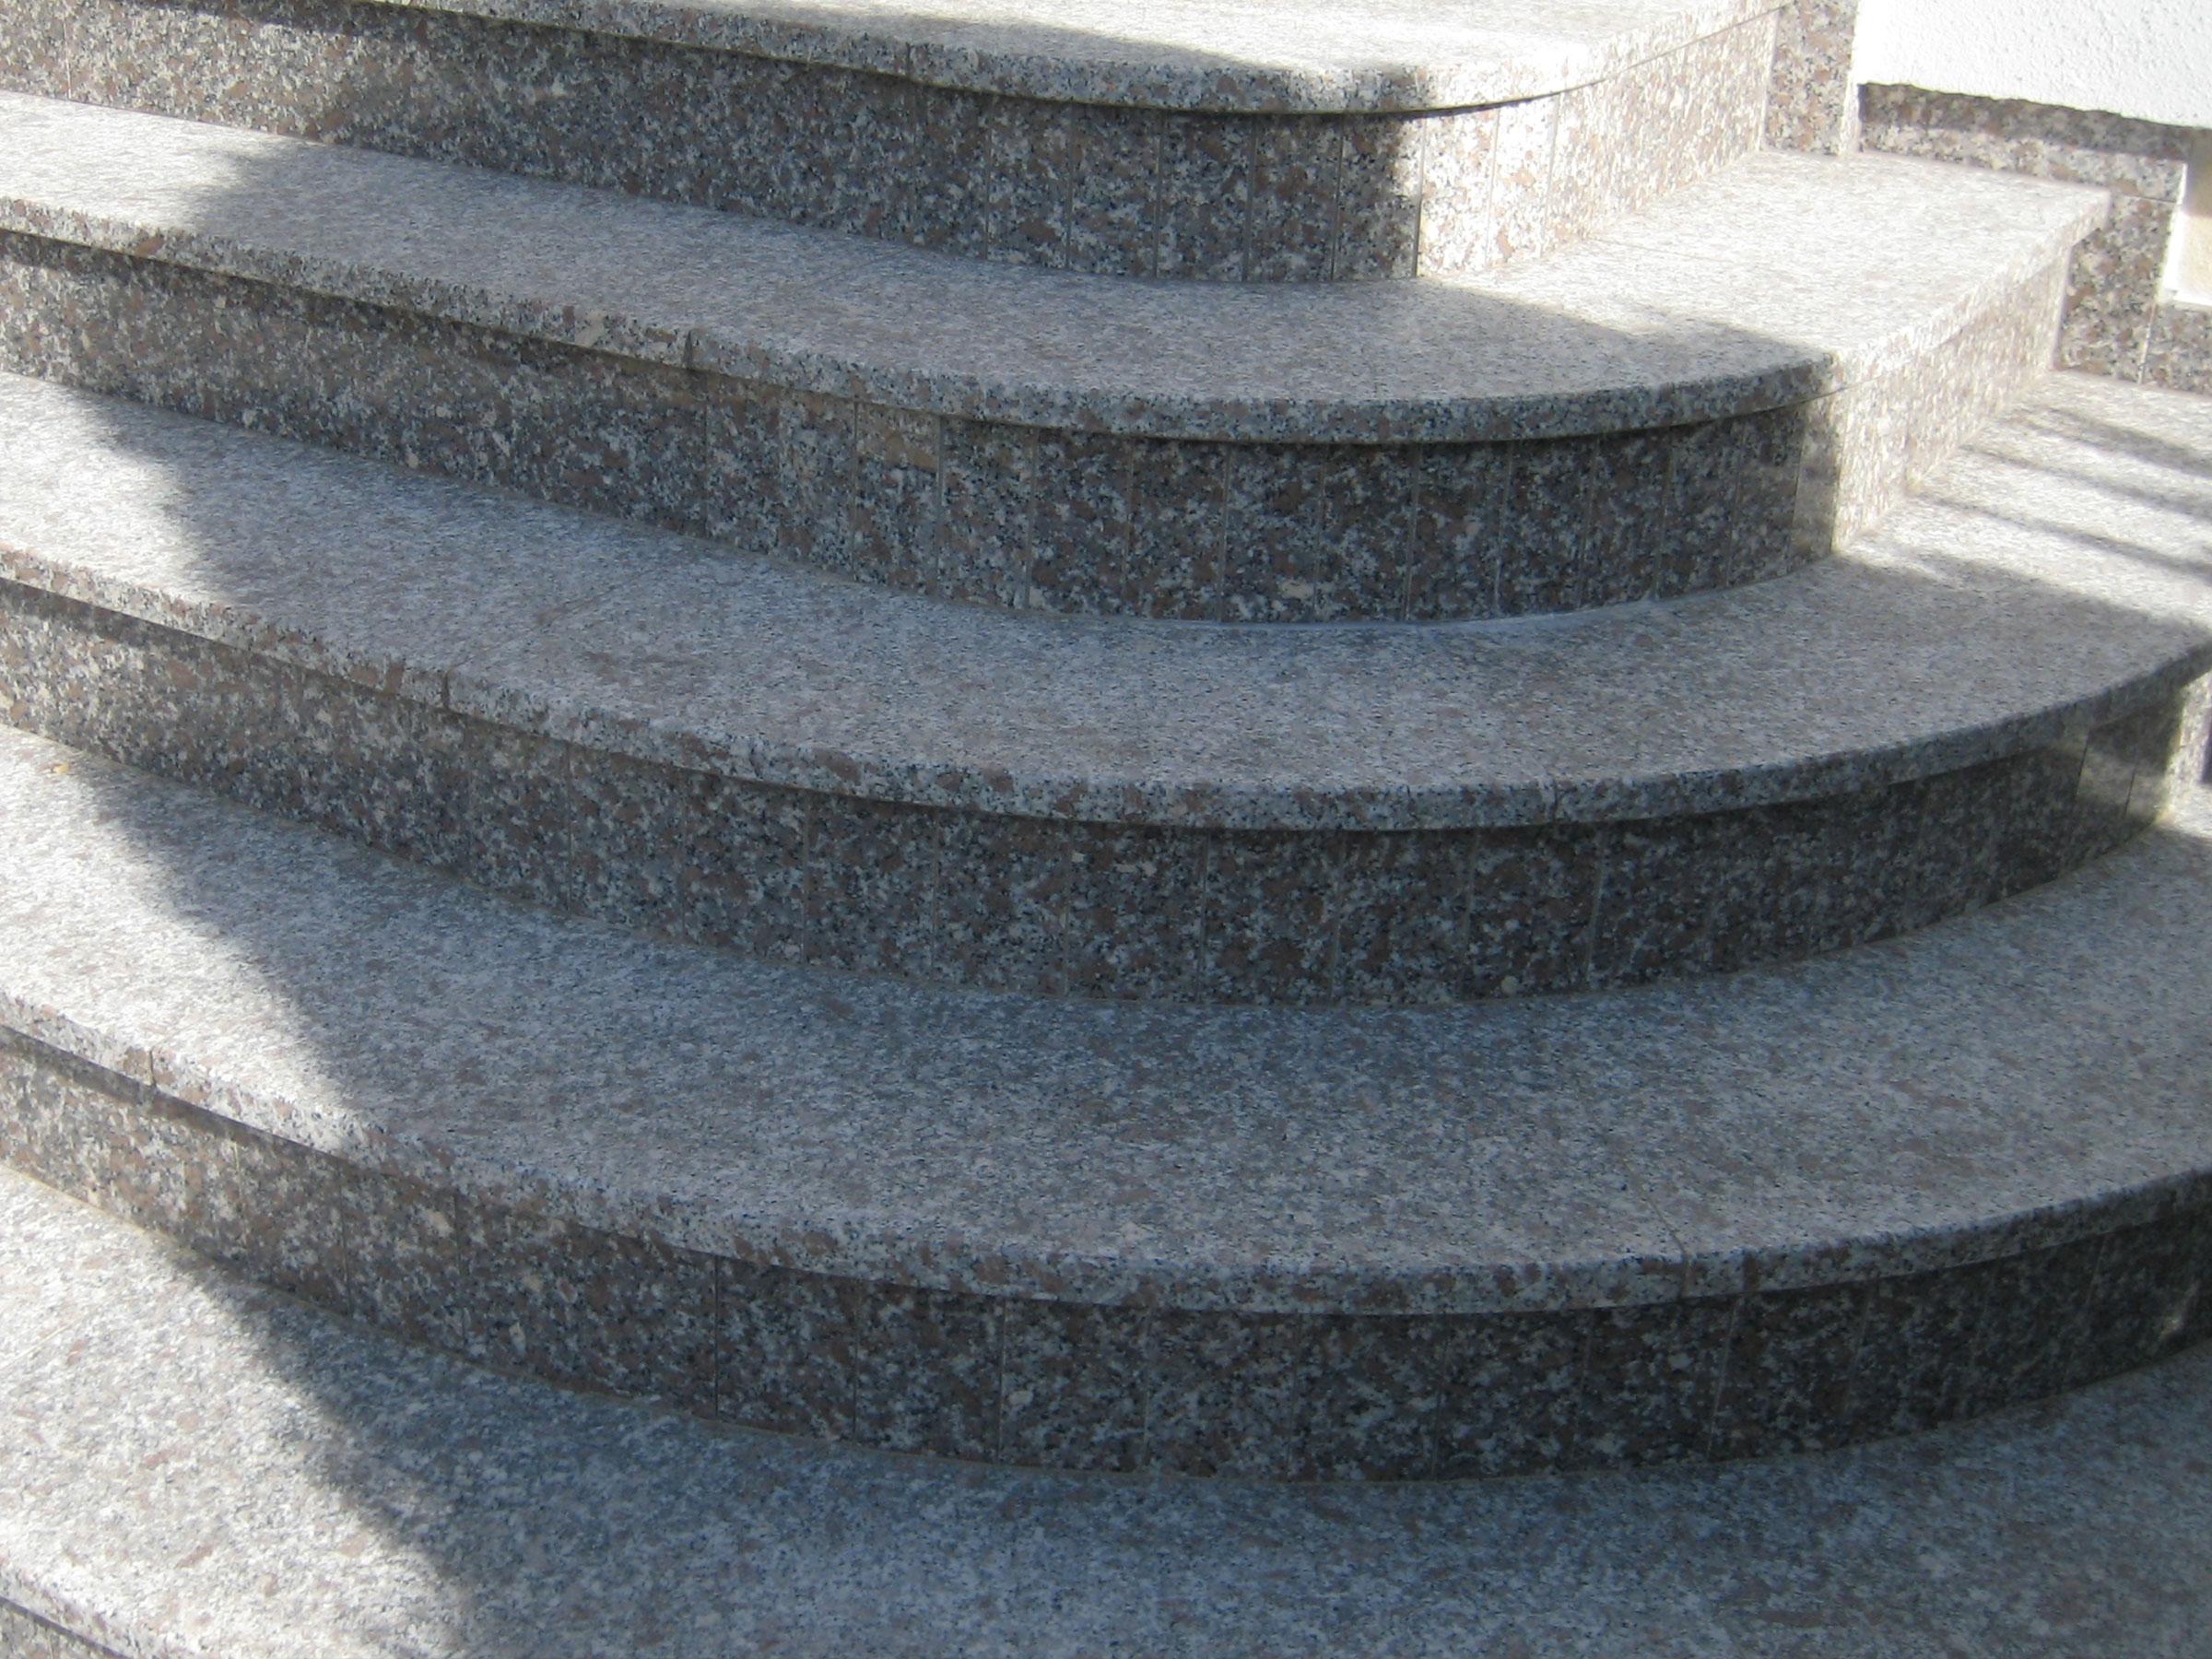 Emejing Escalier En Granit Exterieur Images - Joshkrajcik.us ...